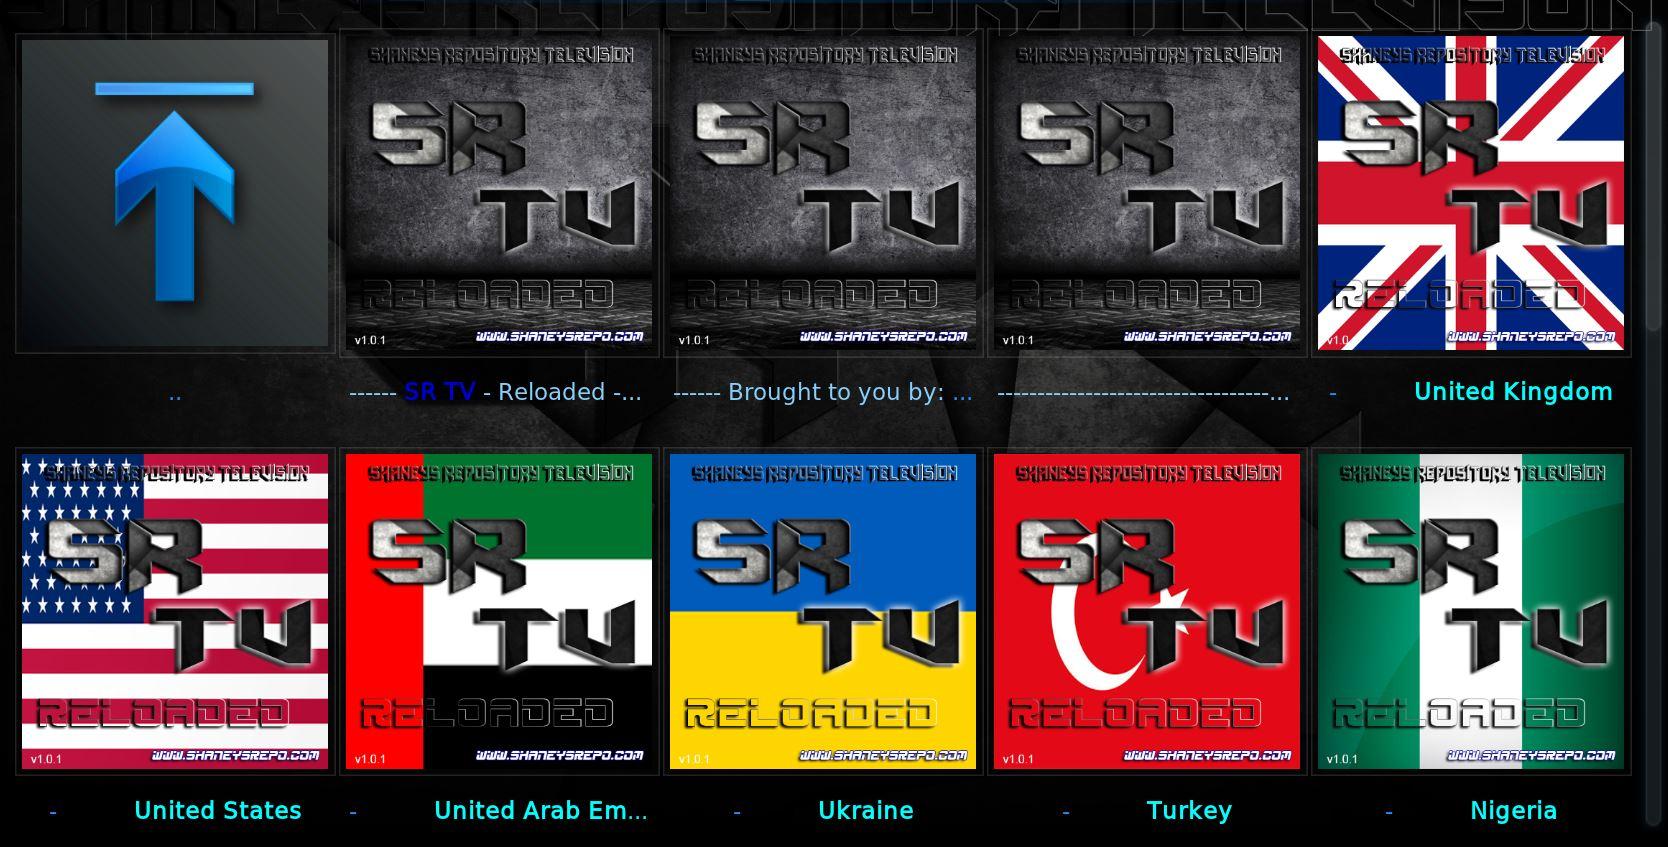 KODI SR TV RELOADED - WATCH LIVE TV - UK - USA - ARABIC